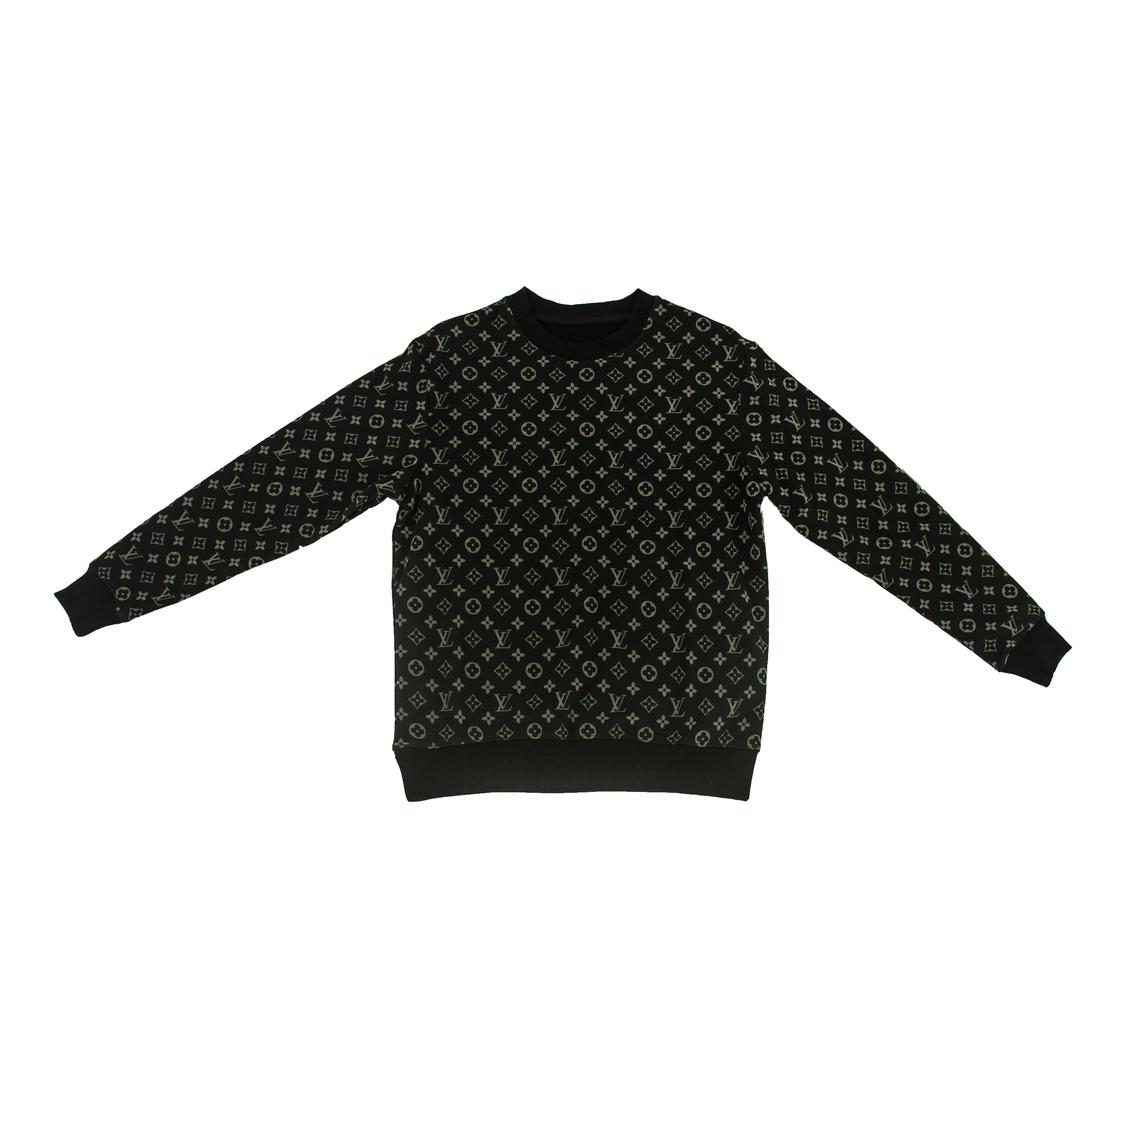 Áo nỉ Louis Vuitton lưới - đen